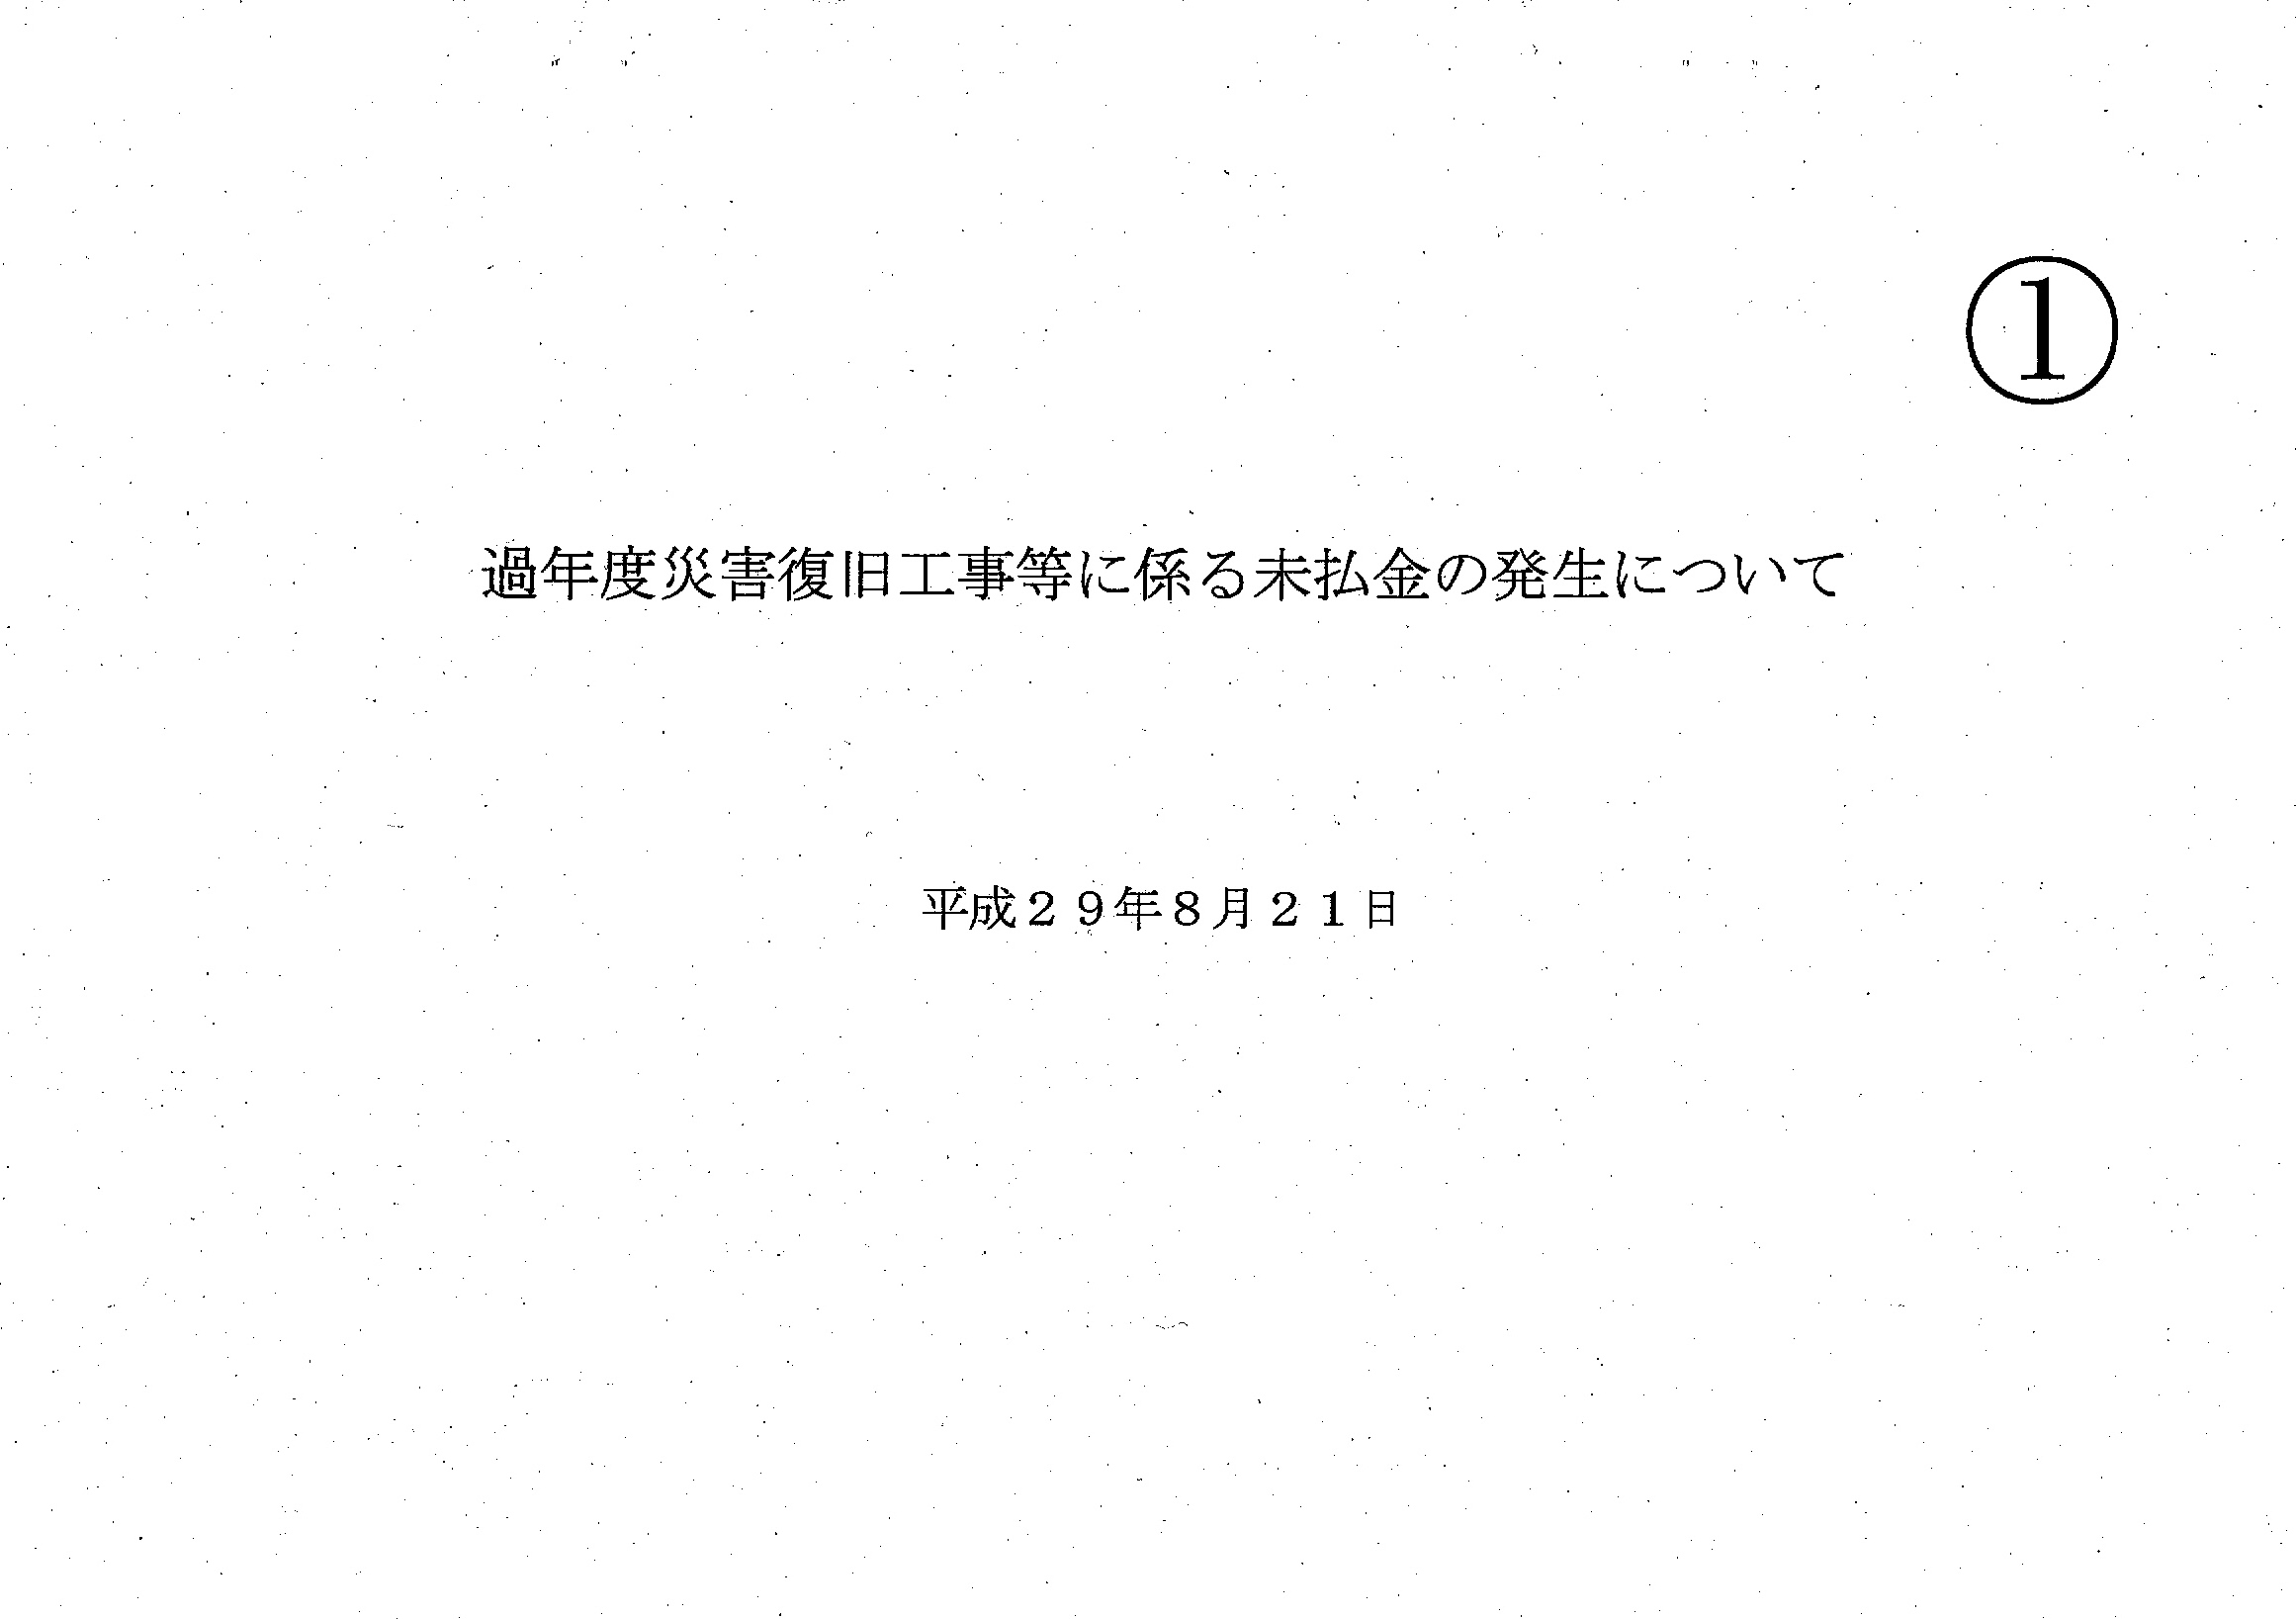 c0006780_18364506.jpg